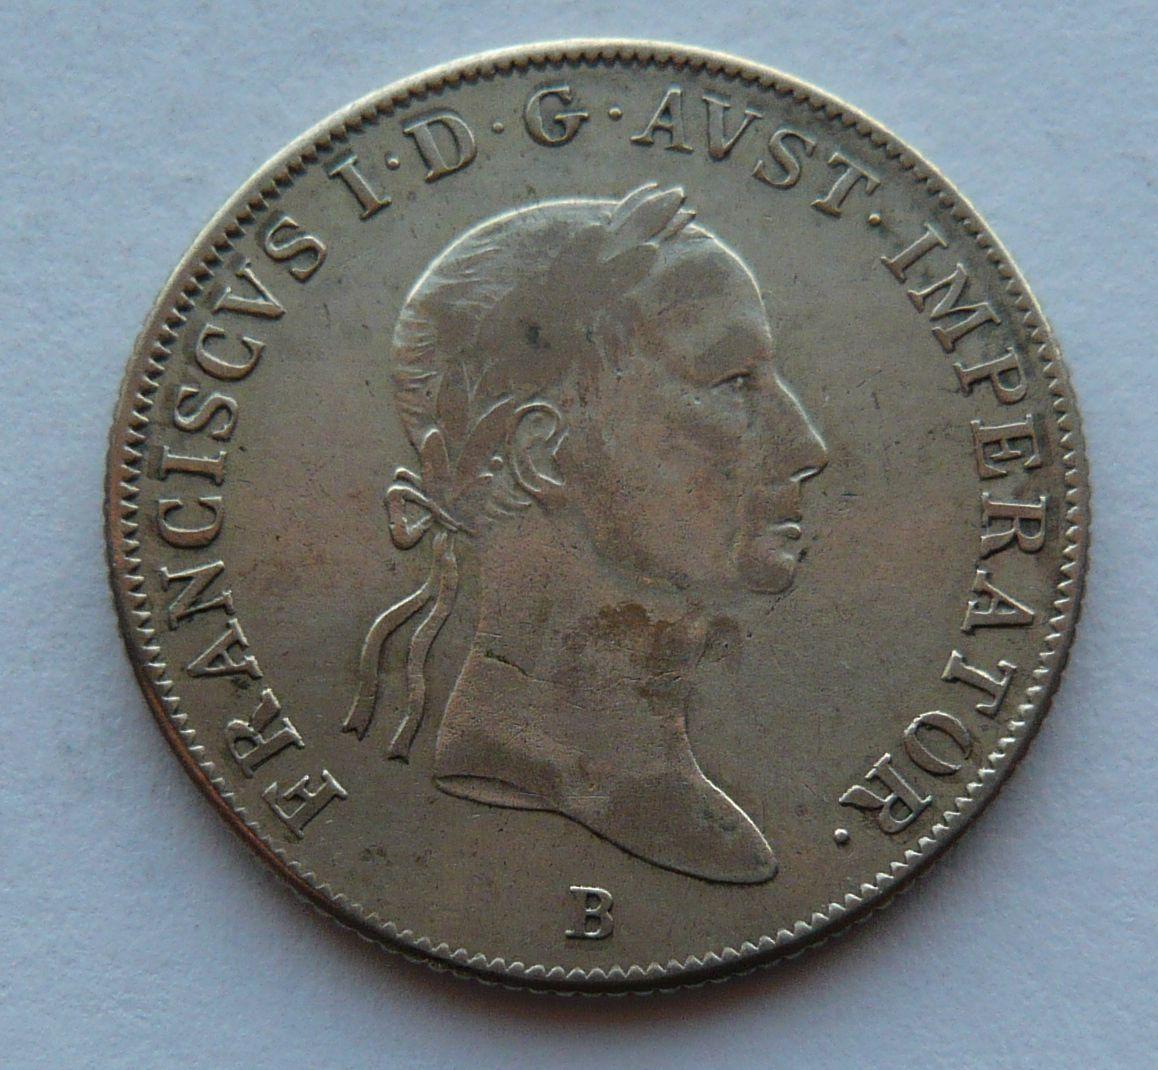 Uhry orlice 20 Krejcar 1835 B František II.